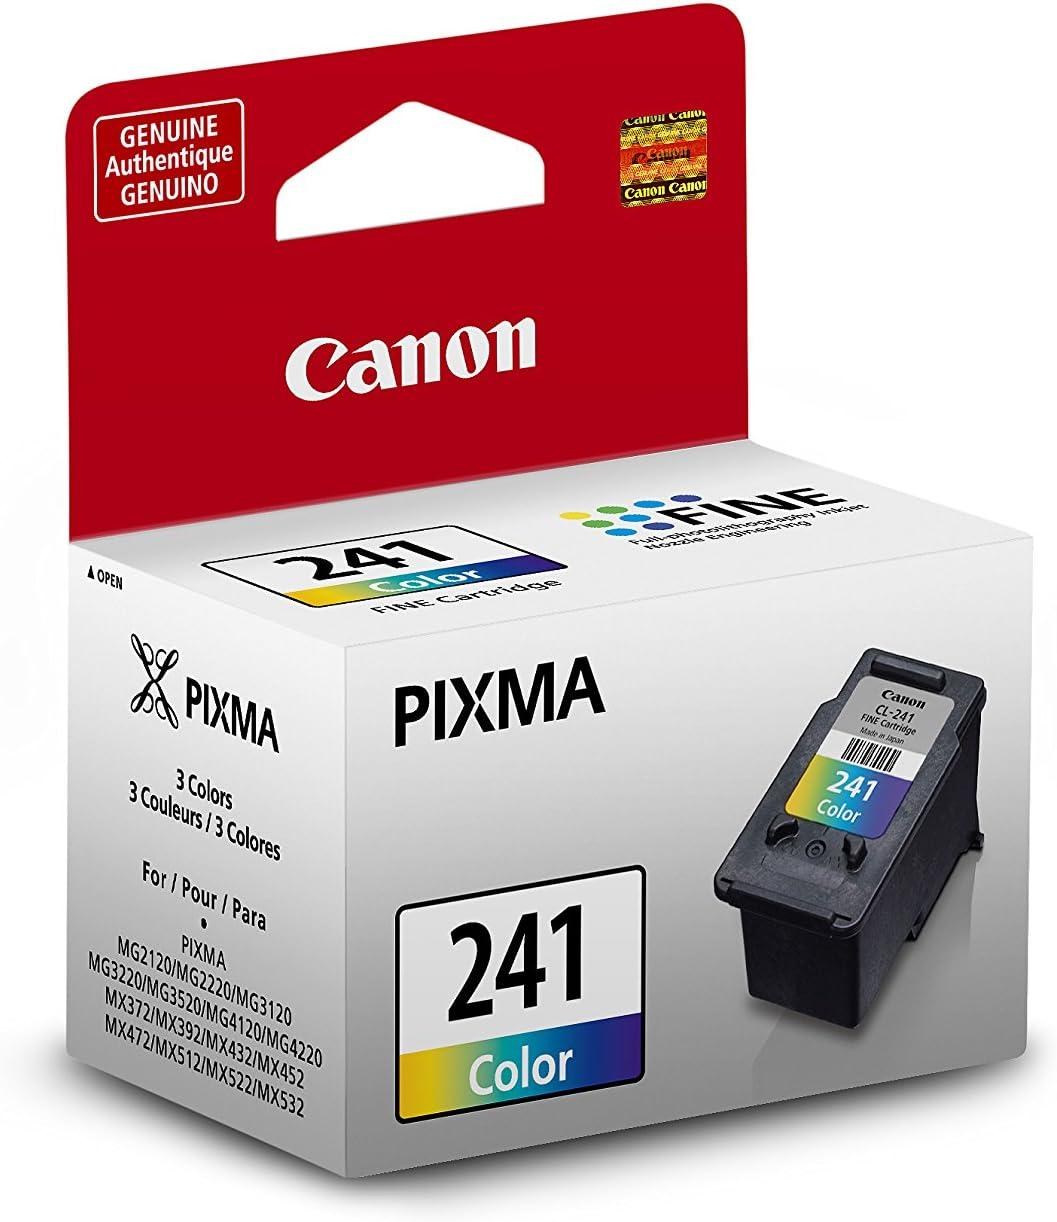 Canon CAN22341 Original Inkjet Cartridges